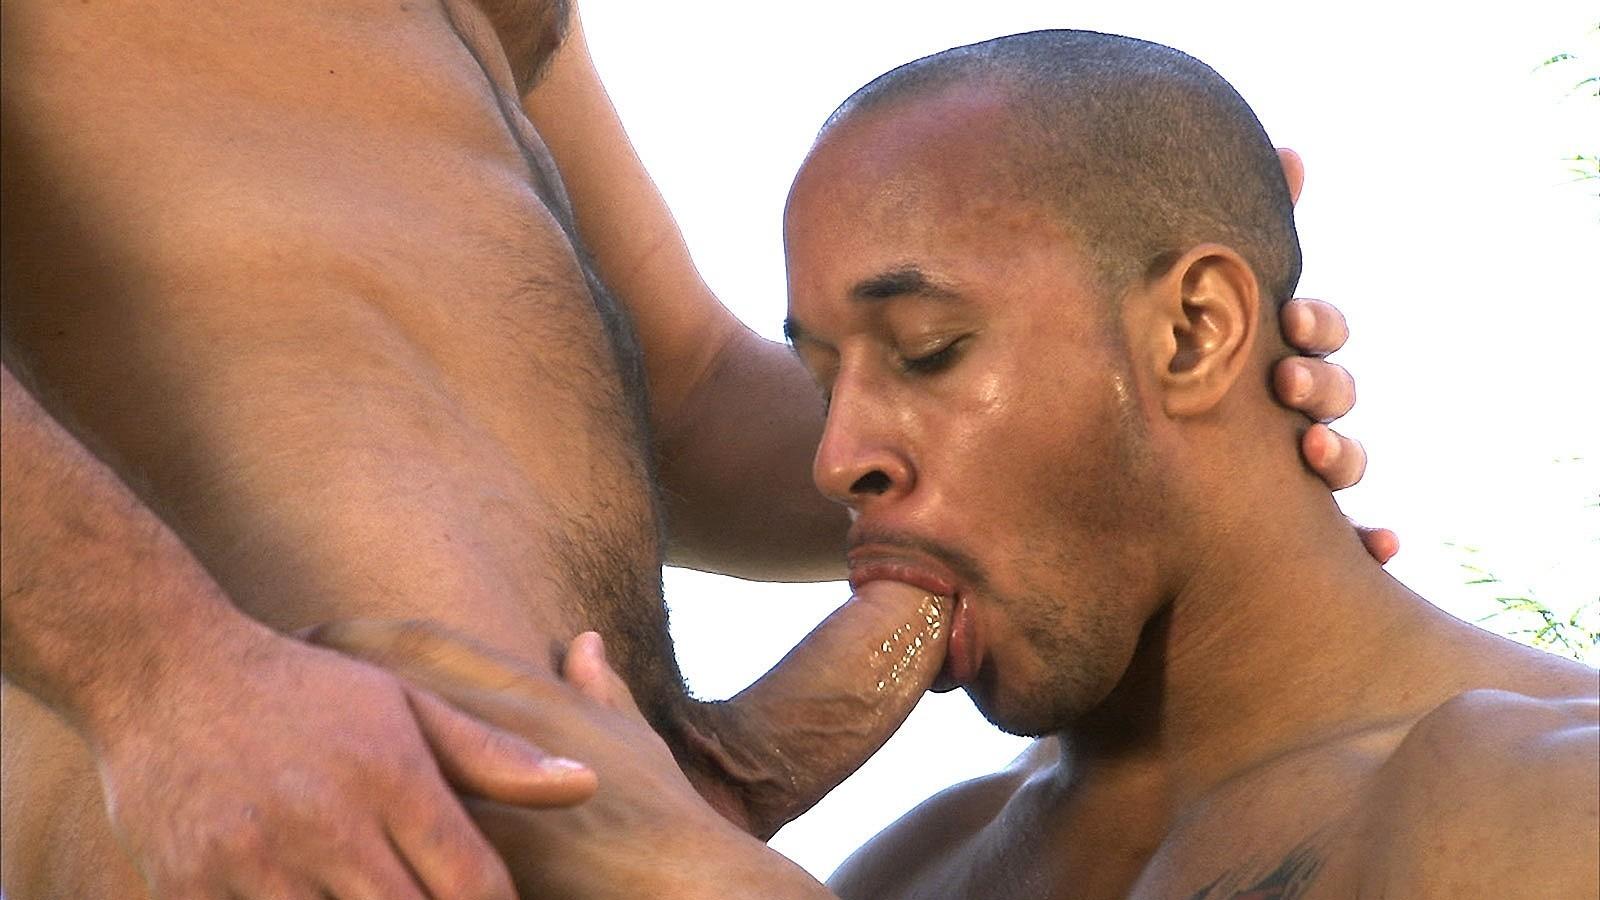 huge plump chubby gay men porn